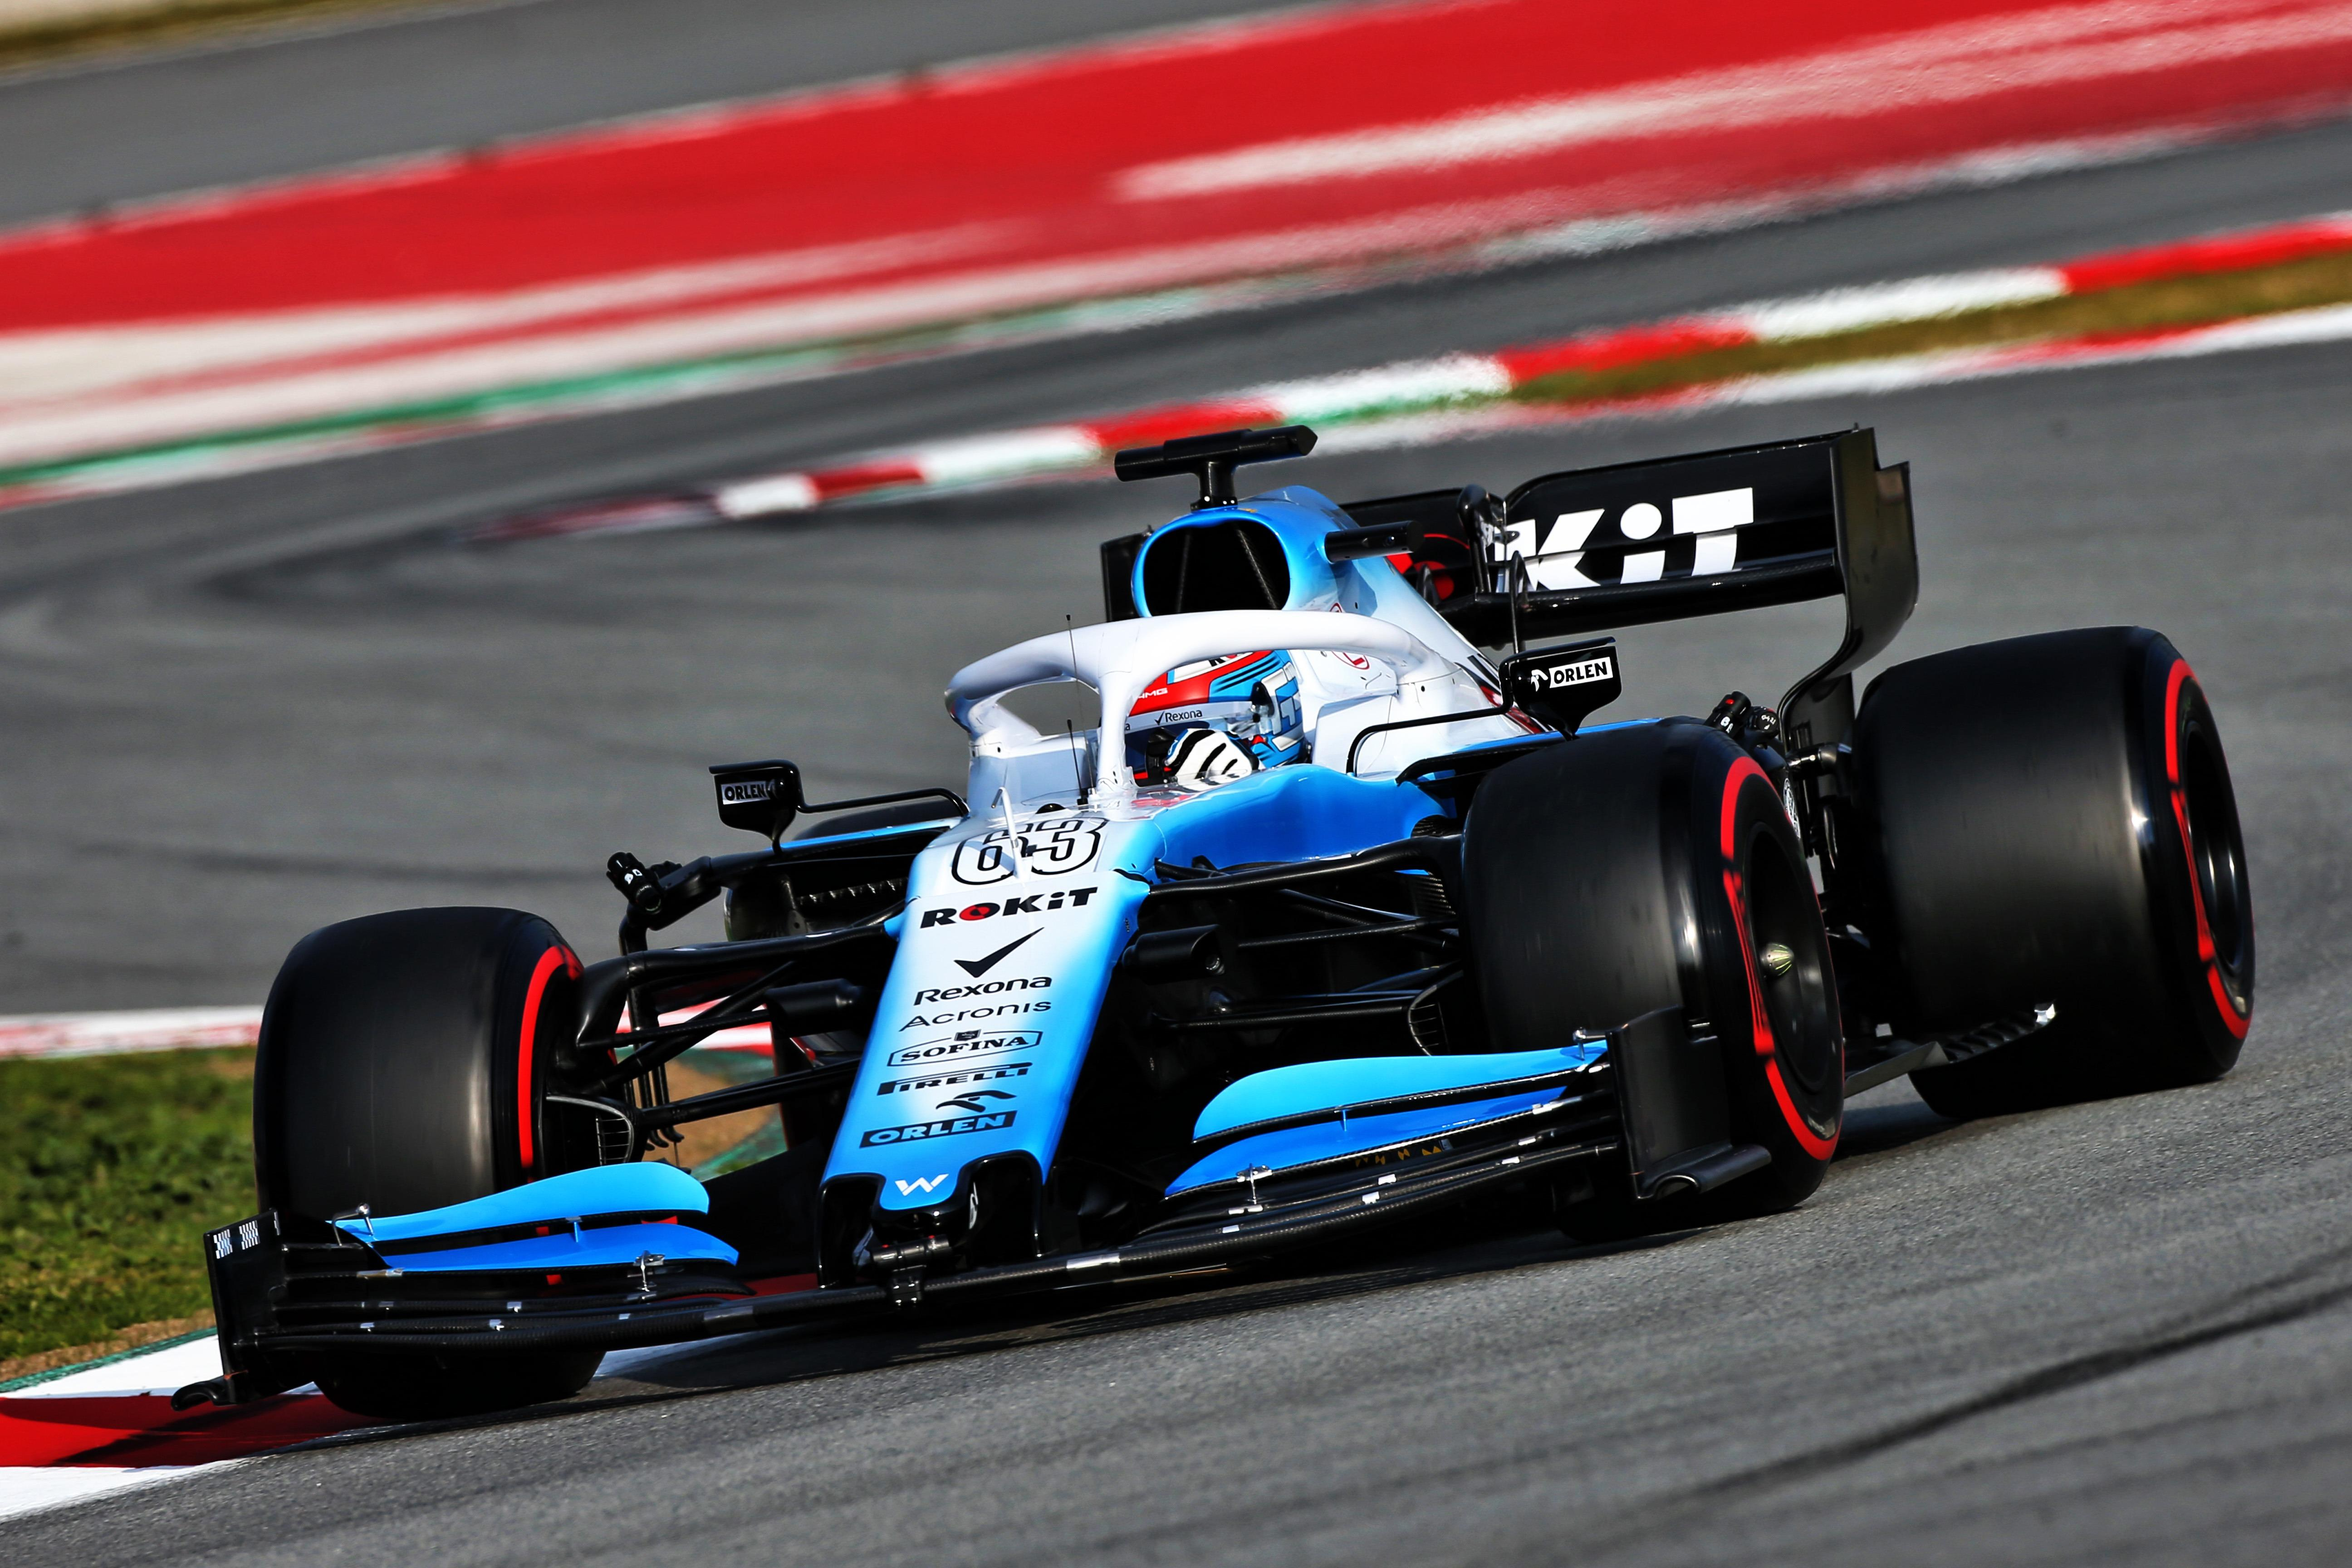 Sports Wallpapers Williams F1 Wallpaper 2019